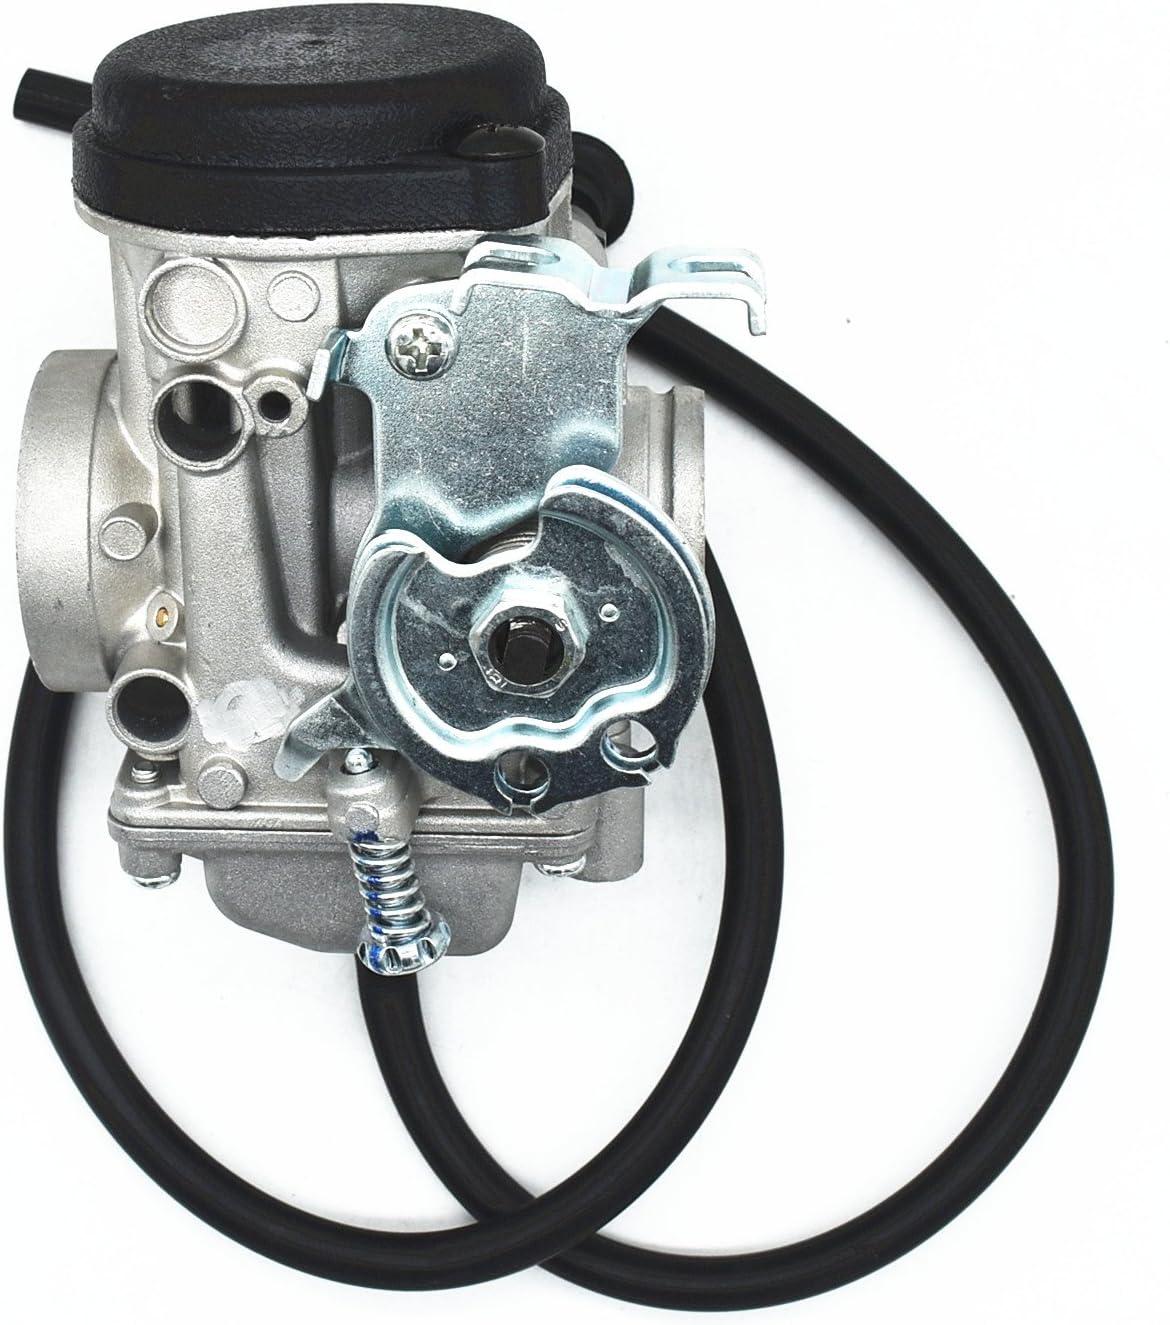 Carbpro Carburetor For YAMAHA TW200 TW 200 2001-2017 200 TRAILWAY Carb NEW